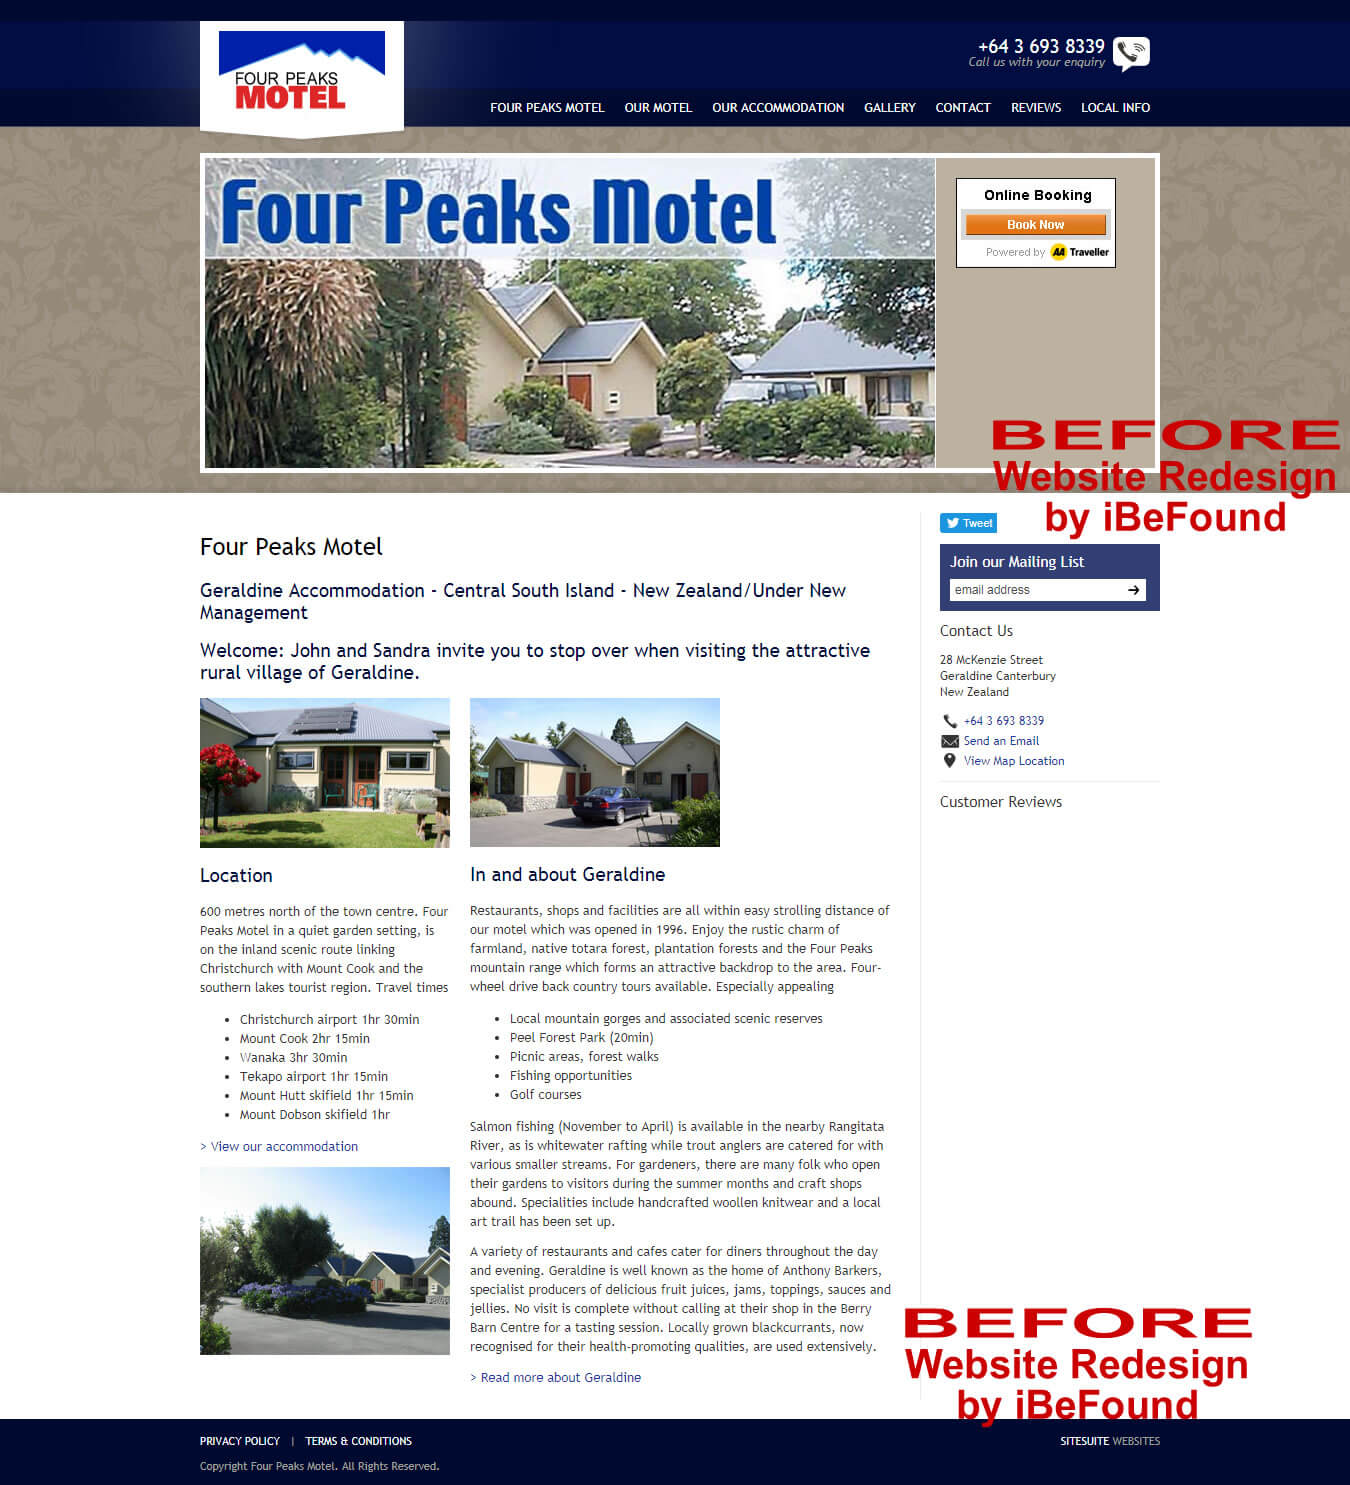 Homepage Of Four Peaks Motel Before Website Redesign By iBeFound Digital Marketing